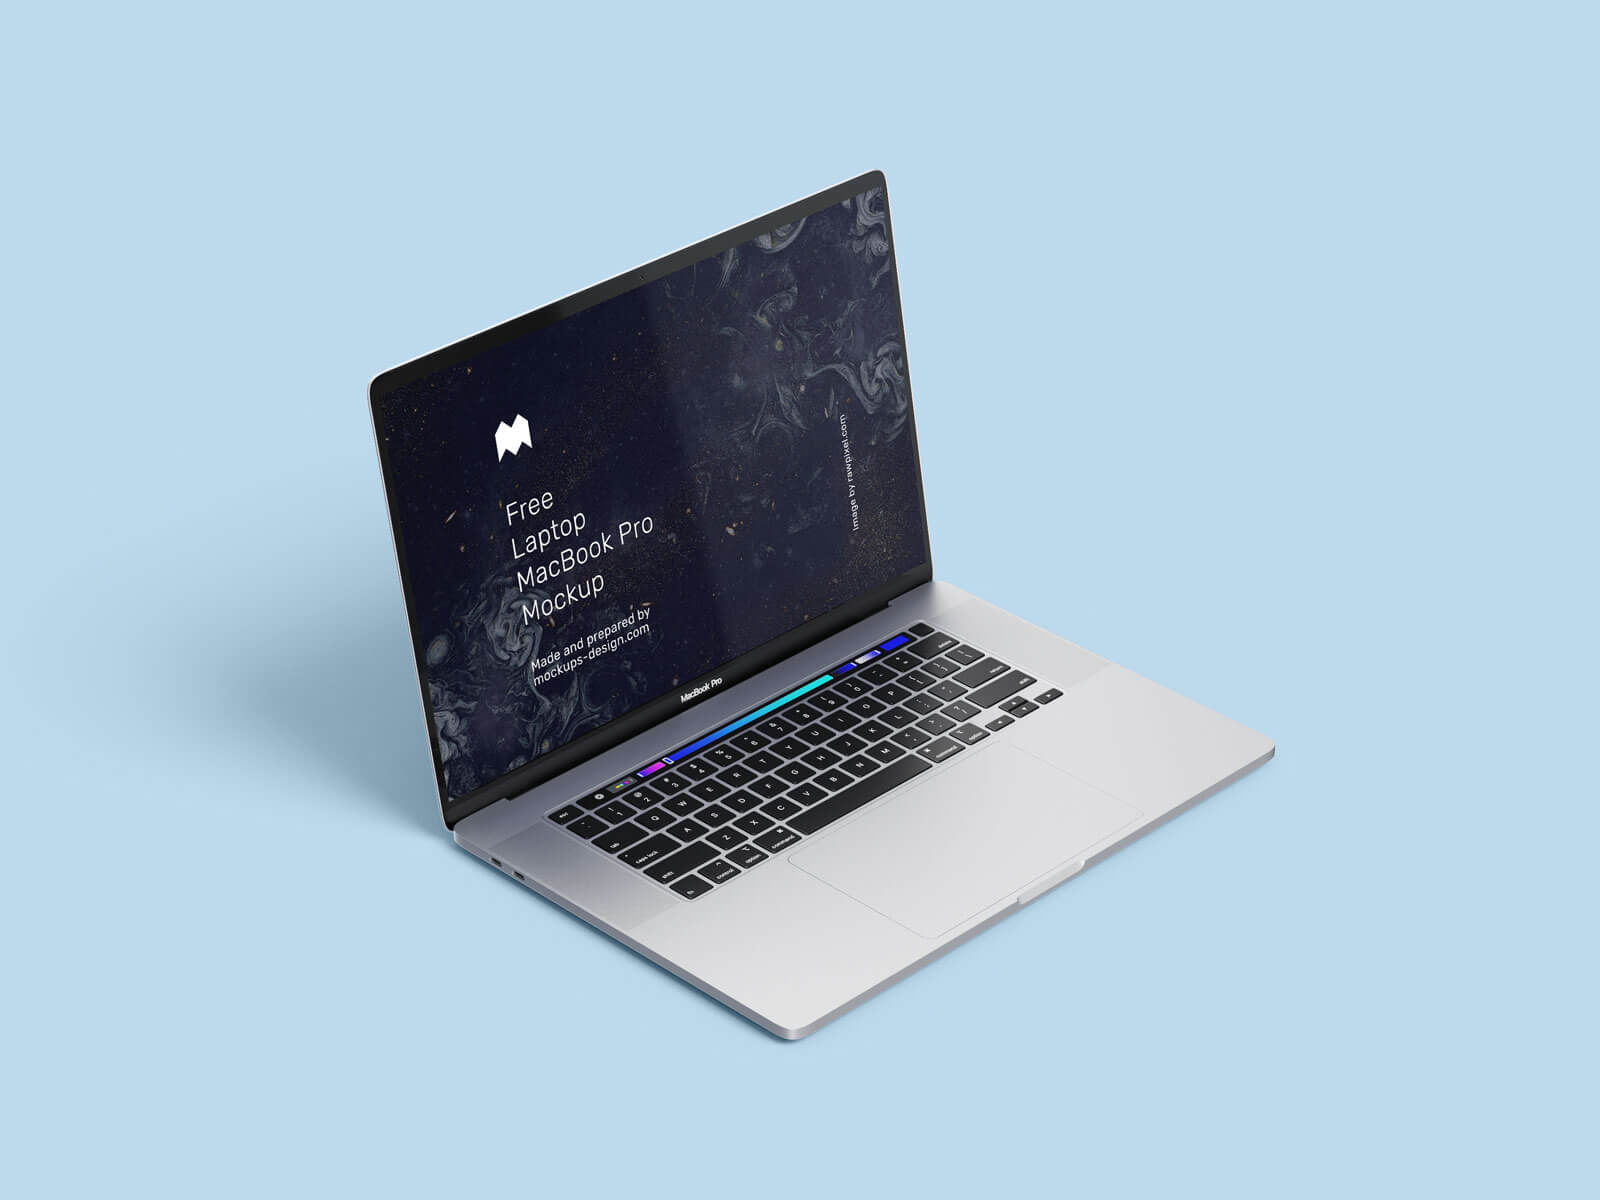 Free Apple Laptop Macbook Pro Mockup PSD Set (1)